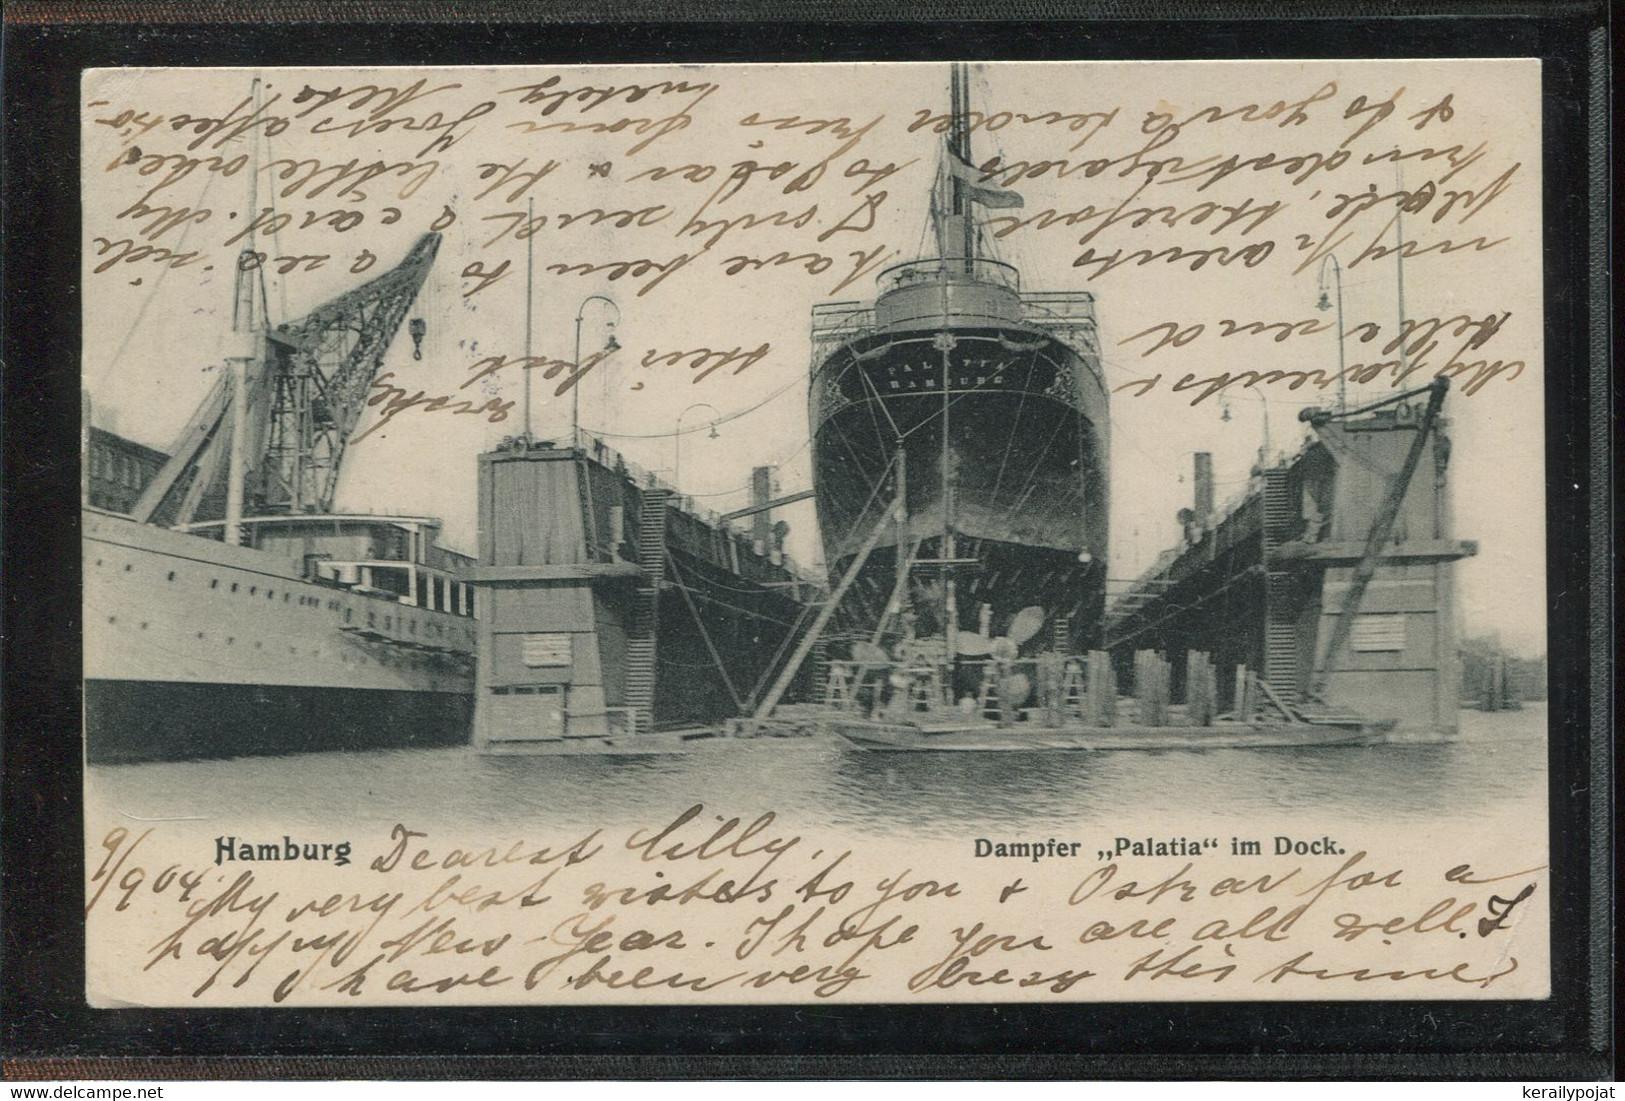 Steamers Dampfer Palatia Im Hamburg Dock -04__(1976) - Paquebote